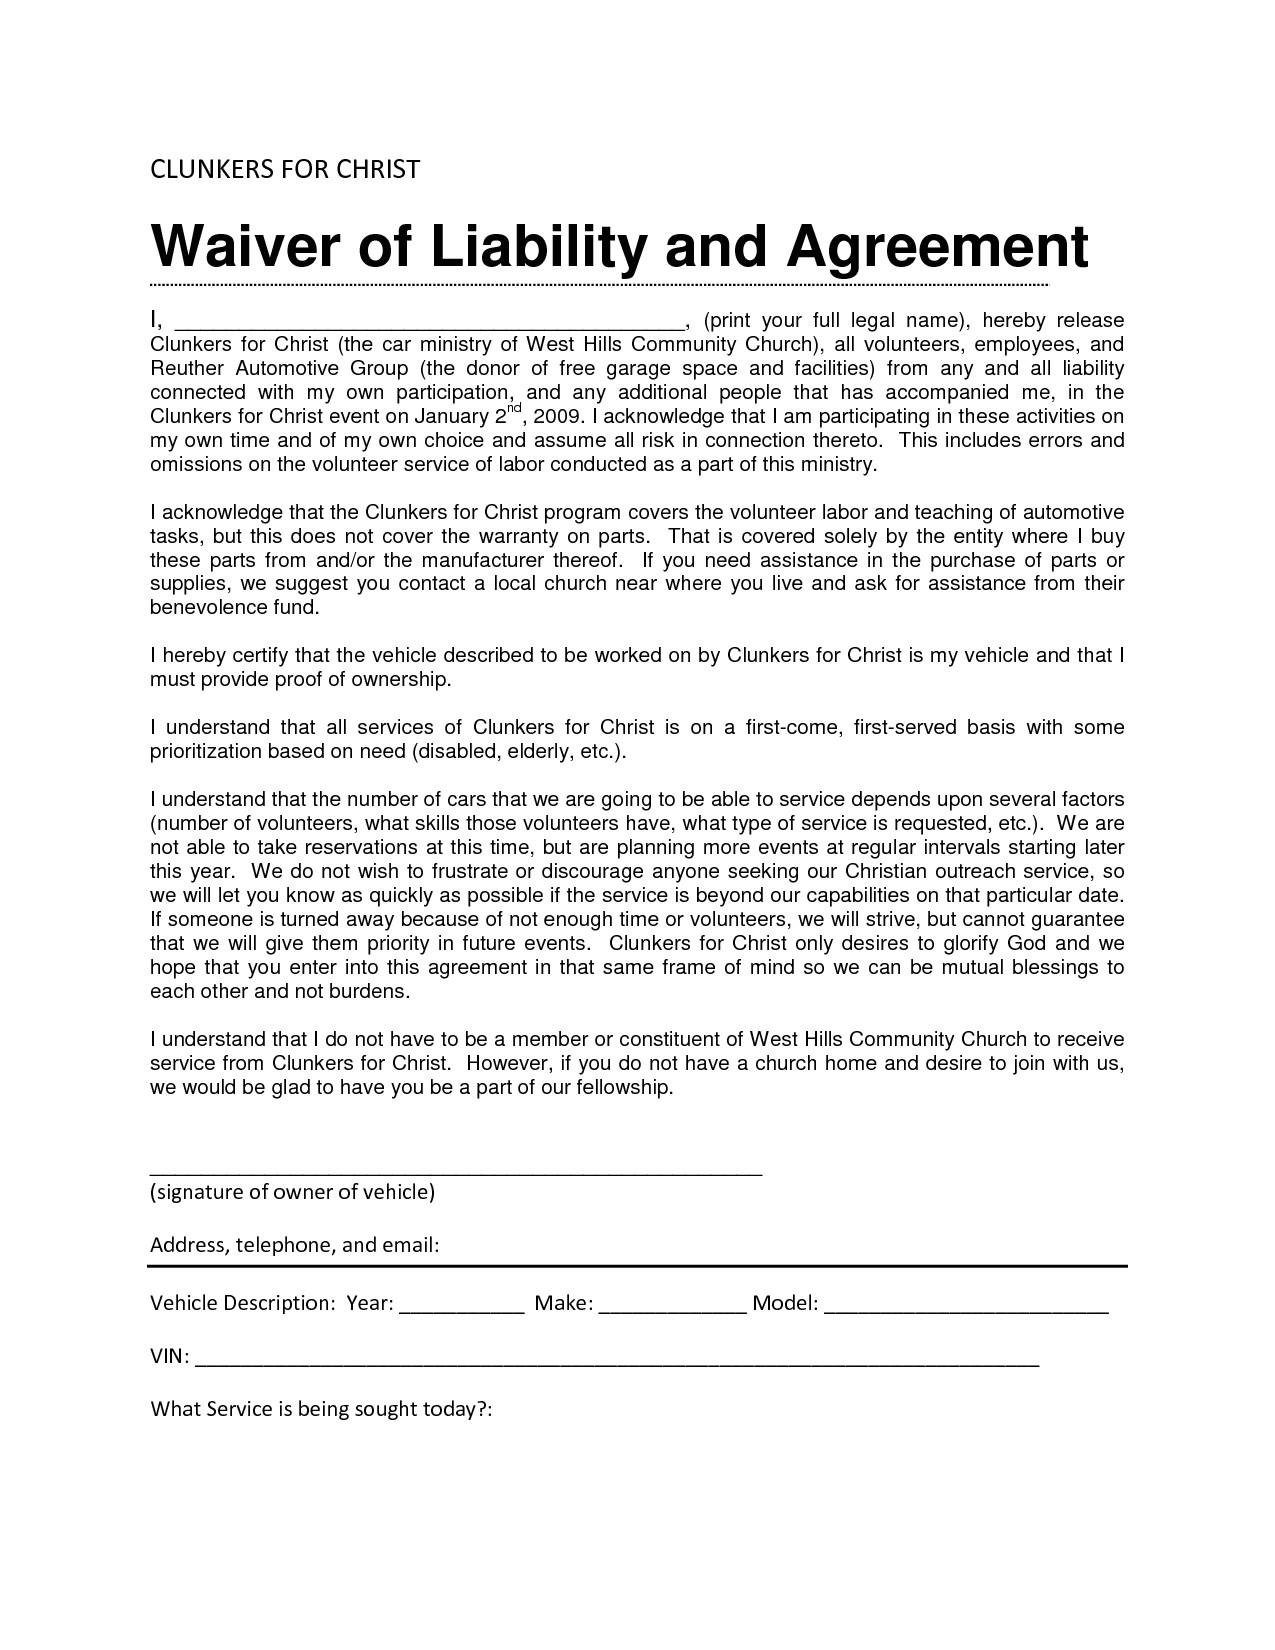 Release Of Liability Contract Template Liability Release form Template Sadamatsu Hp